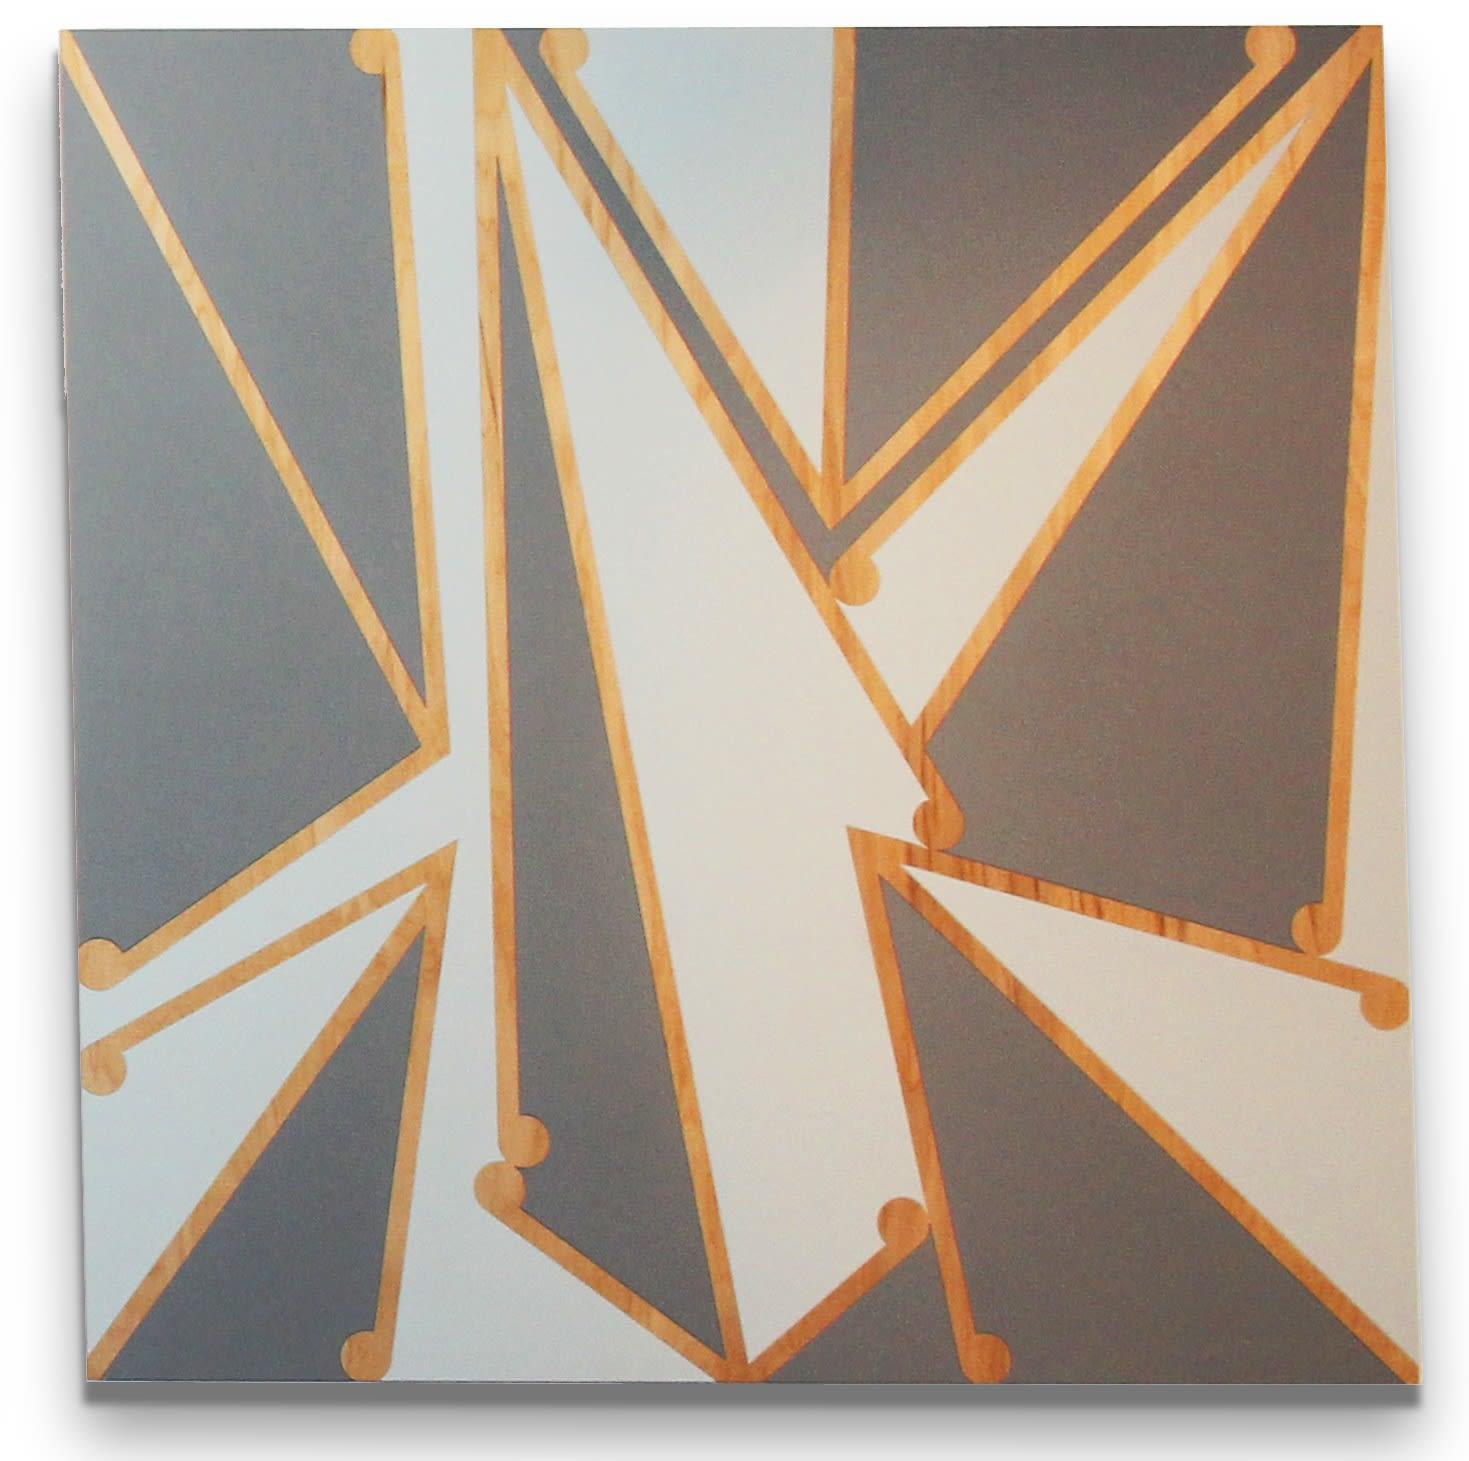 "<span class=""link fancybox-details-link""><a href=""/artists/58-ngataiharuru-taepa/works/6749-ngataiharuru-taepa-maunga-nekeneke-3-2013/"">View Detail Page</a></span><div class=""artist""><strong>Ngataiharuru TAEPA</strong></div> <div class=""title""><em>Maunga Nekeneke 3</em>, 2013</div> <div class=""medium"">Acrylic on wood</div> <div class=""dimensions"">43.3 x 43.3 in<br />110 x 110 cm</div>"